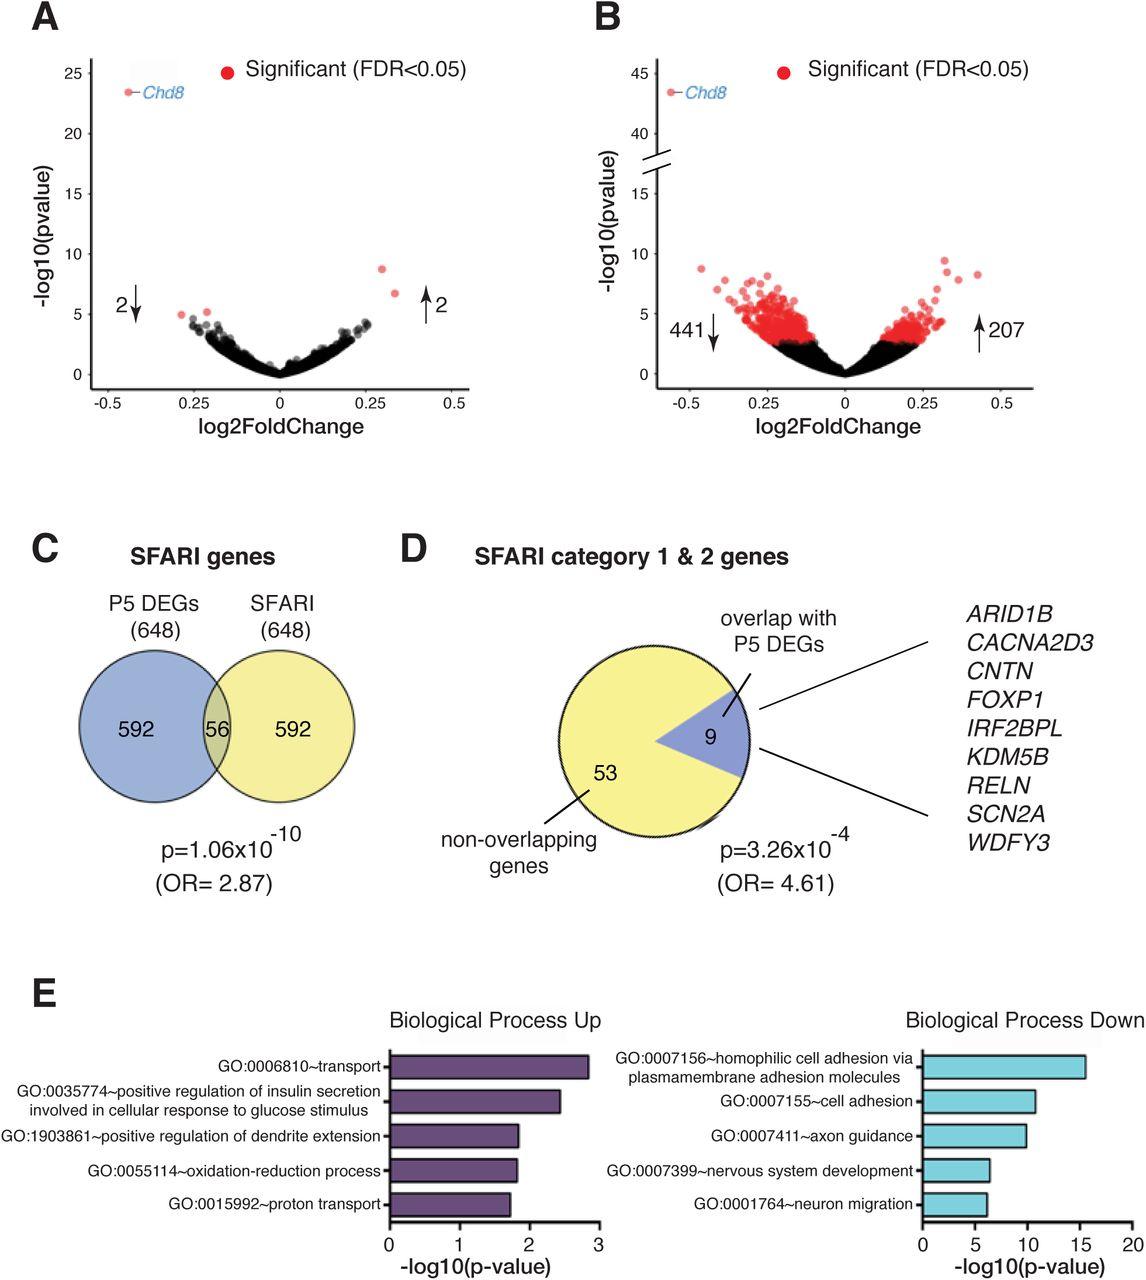 Chd8 haploinsufficient mice display anomalous behaviours